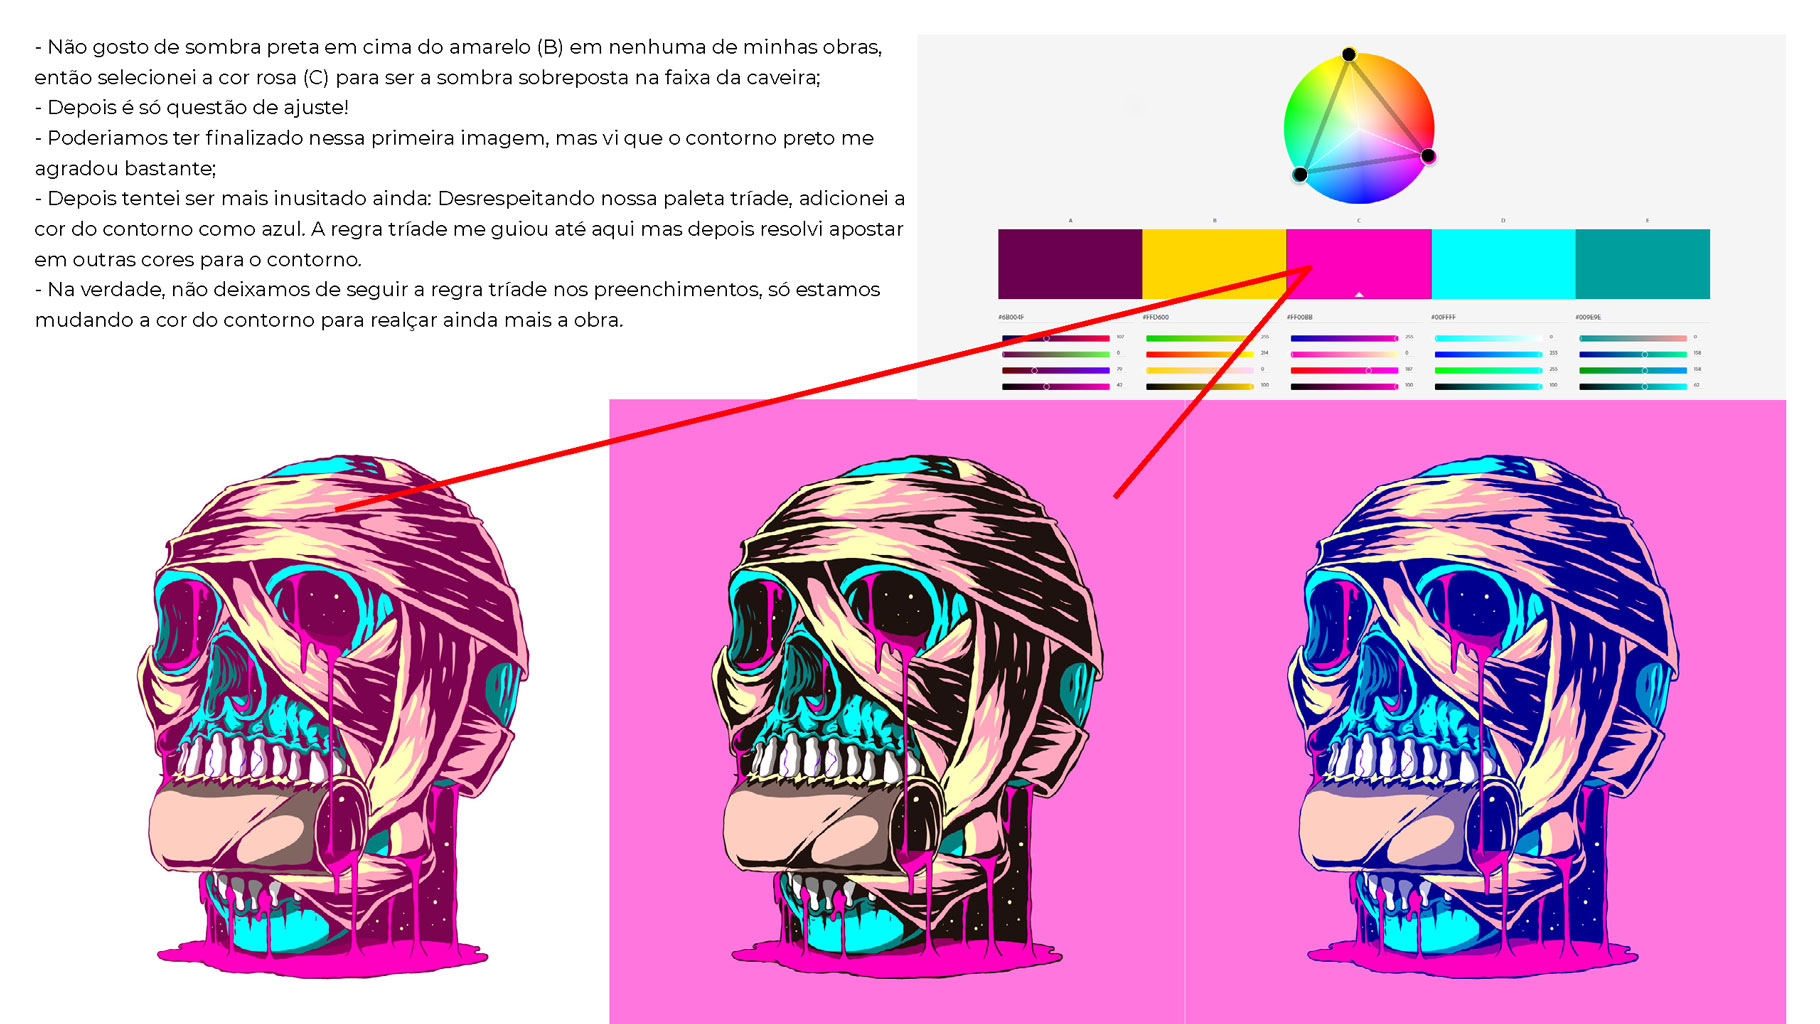 [淘宝购买] 300款色彩亮丽蒸汽波风动画绘画色板色轮模板素材 300 Color Swatches For Adobe Illustrator & Adobe Photoshop插图(13)